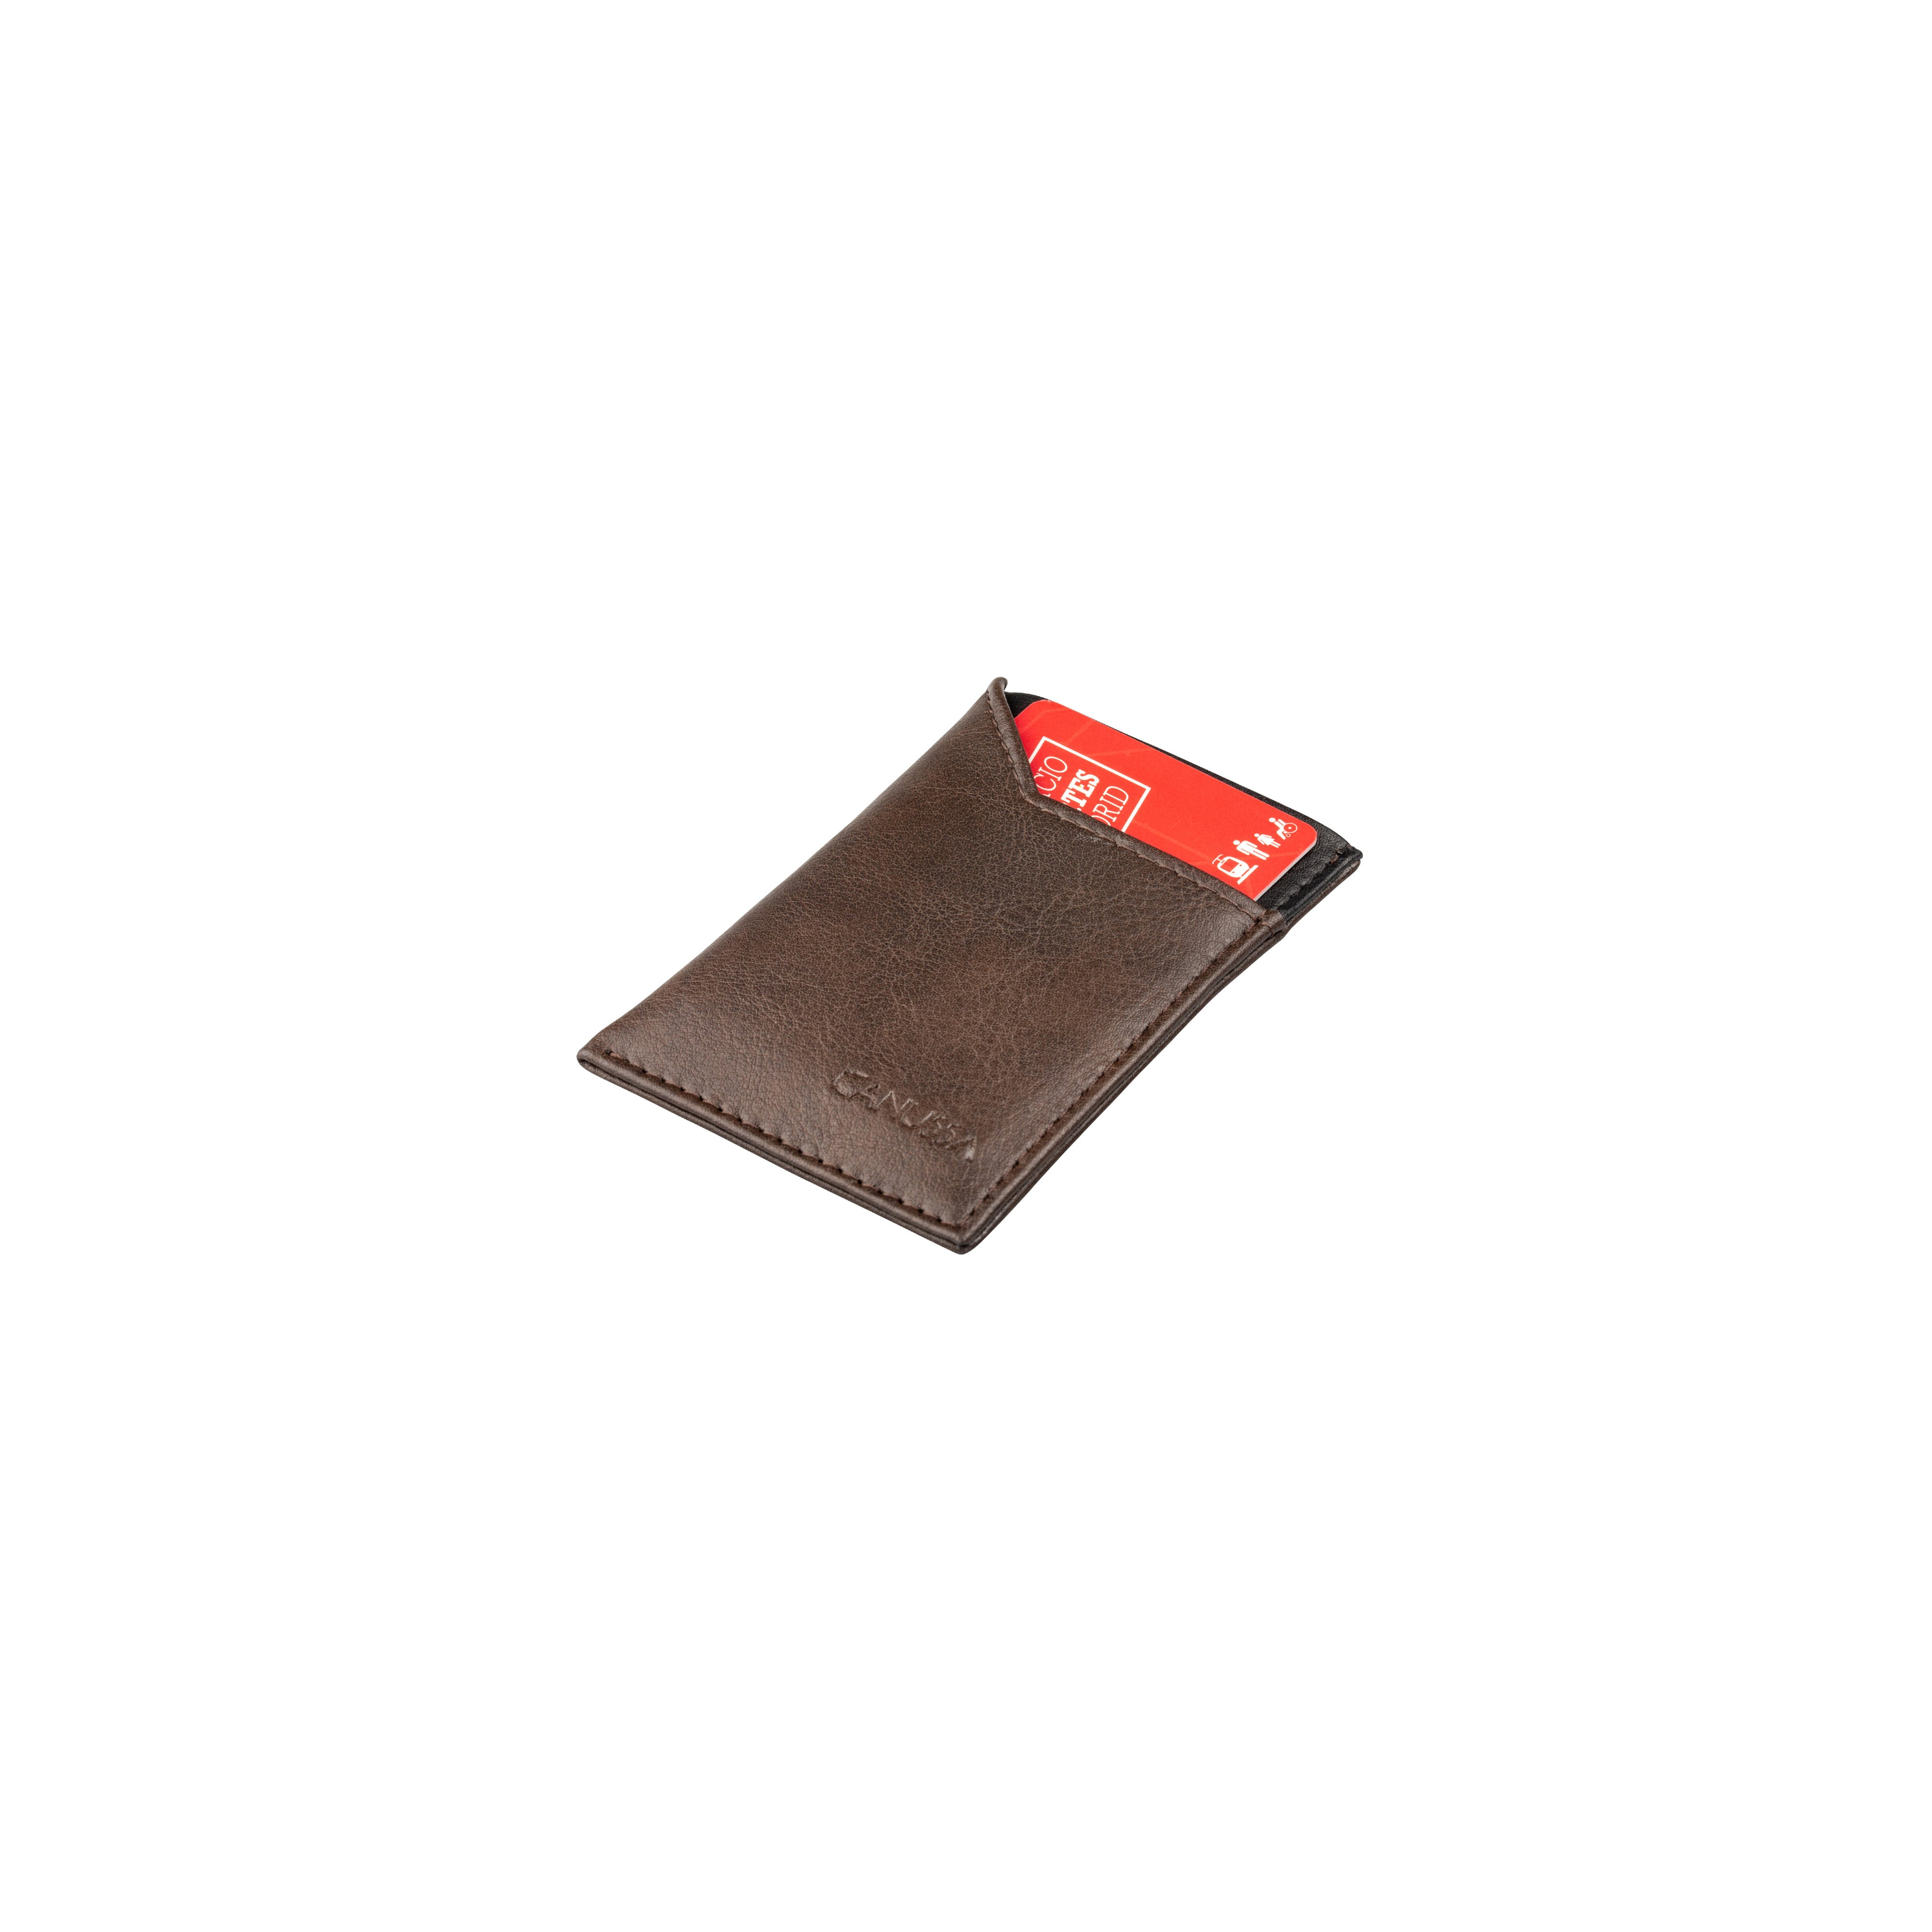 Canussa Wallet Vegan Card holder - Brown/Black